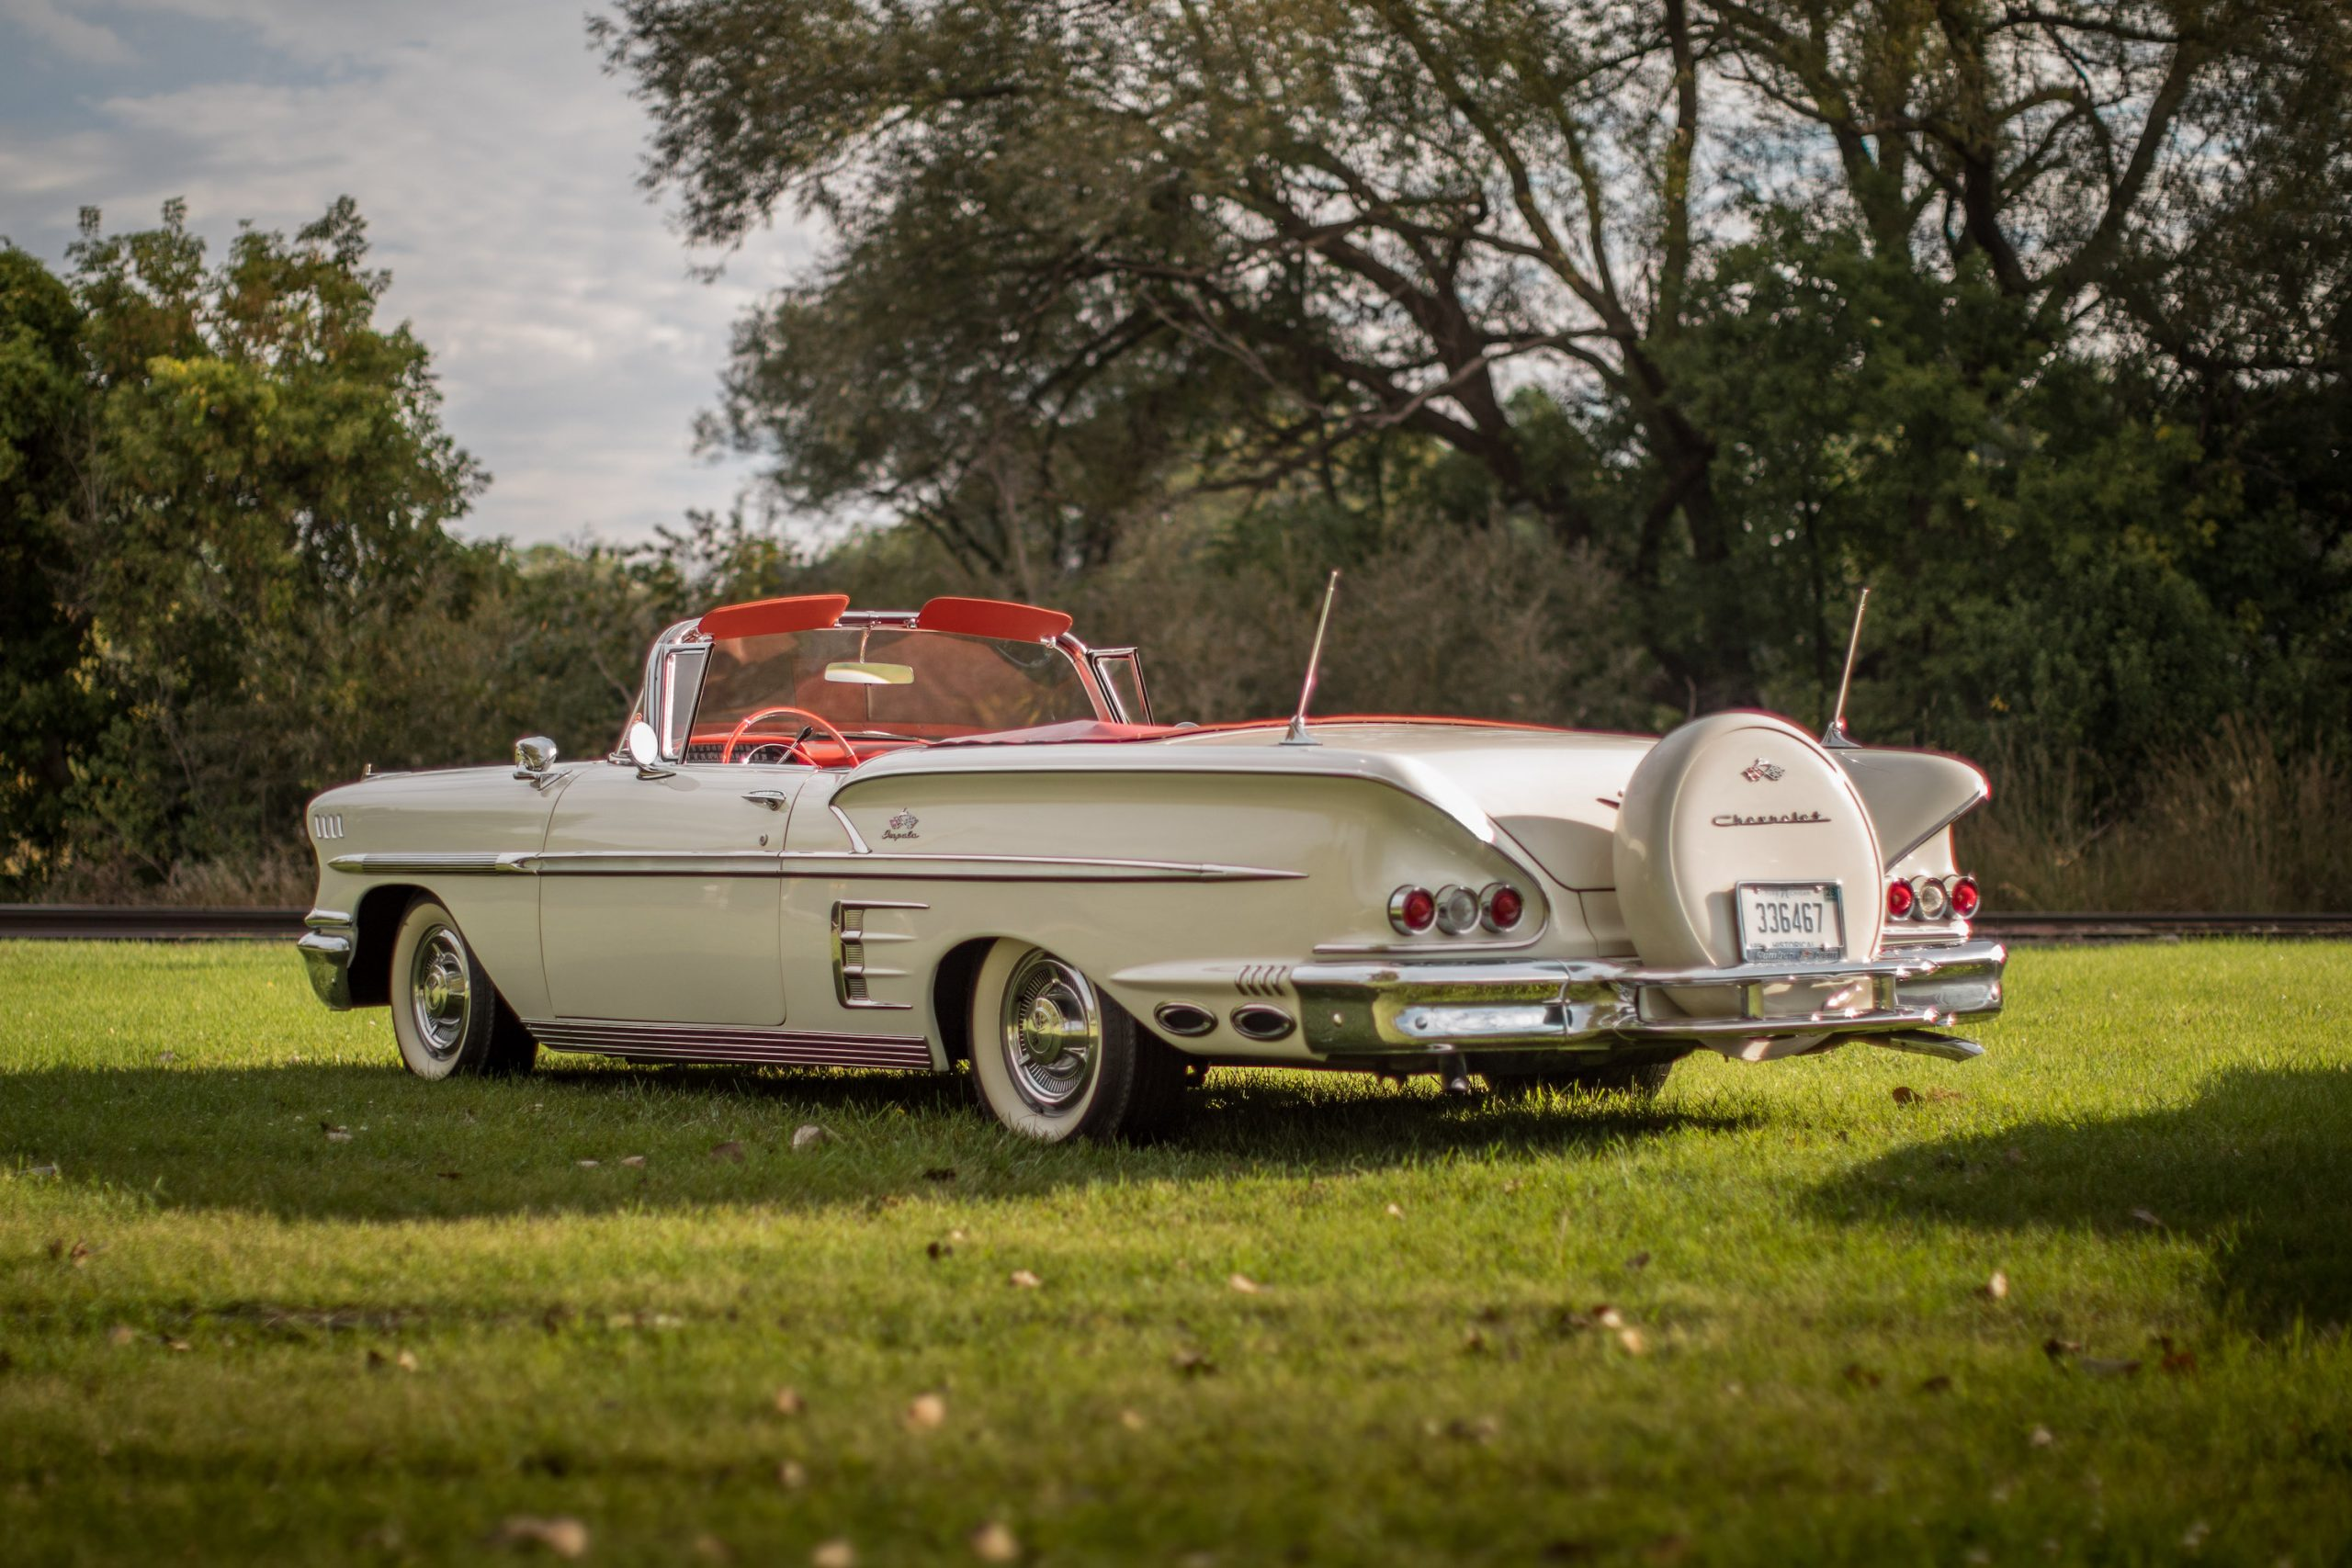 1958 Chevrolet Impala Convertible Rear Three-Quarter